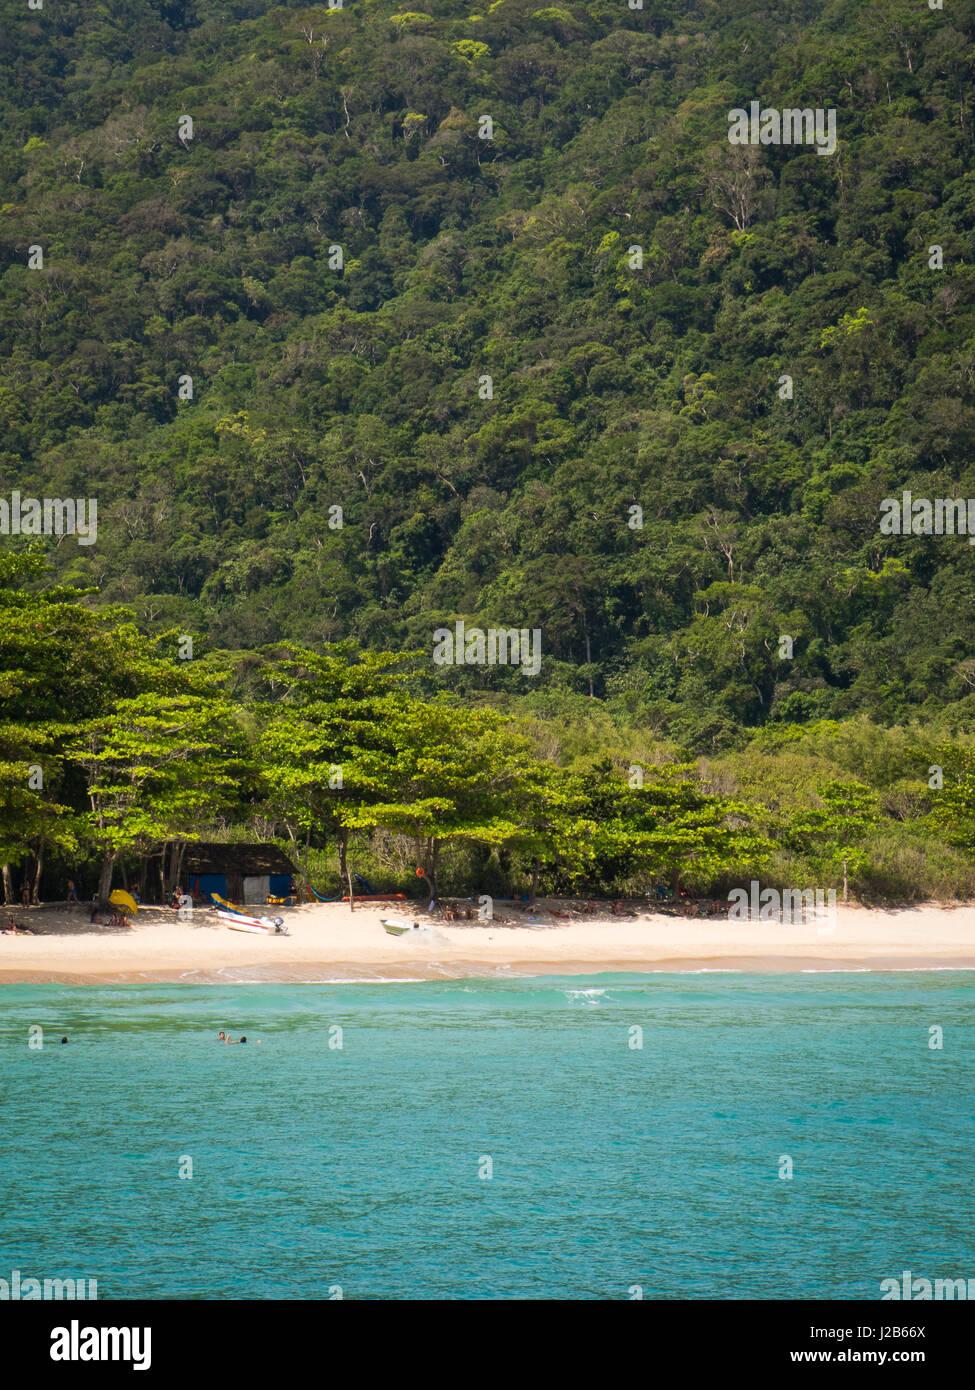 Sandy heavenly beach Martins de Sa, near Paraty, Rio de Janeiro, Brazil. - Stock Image